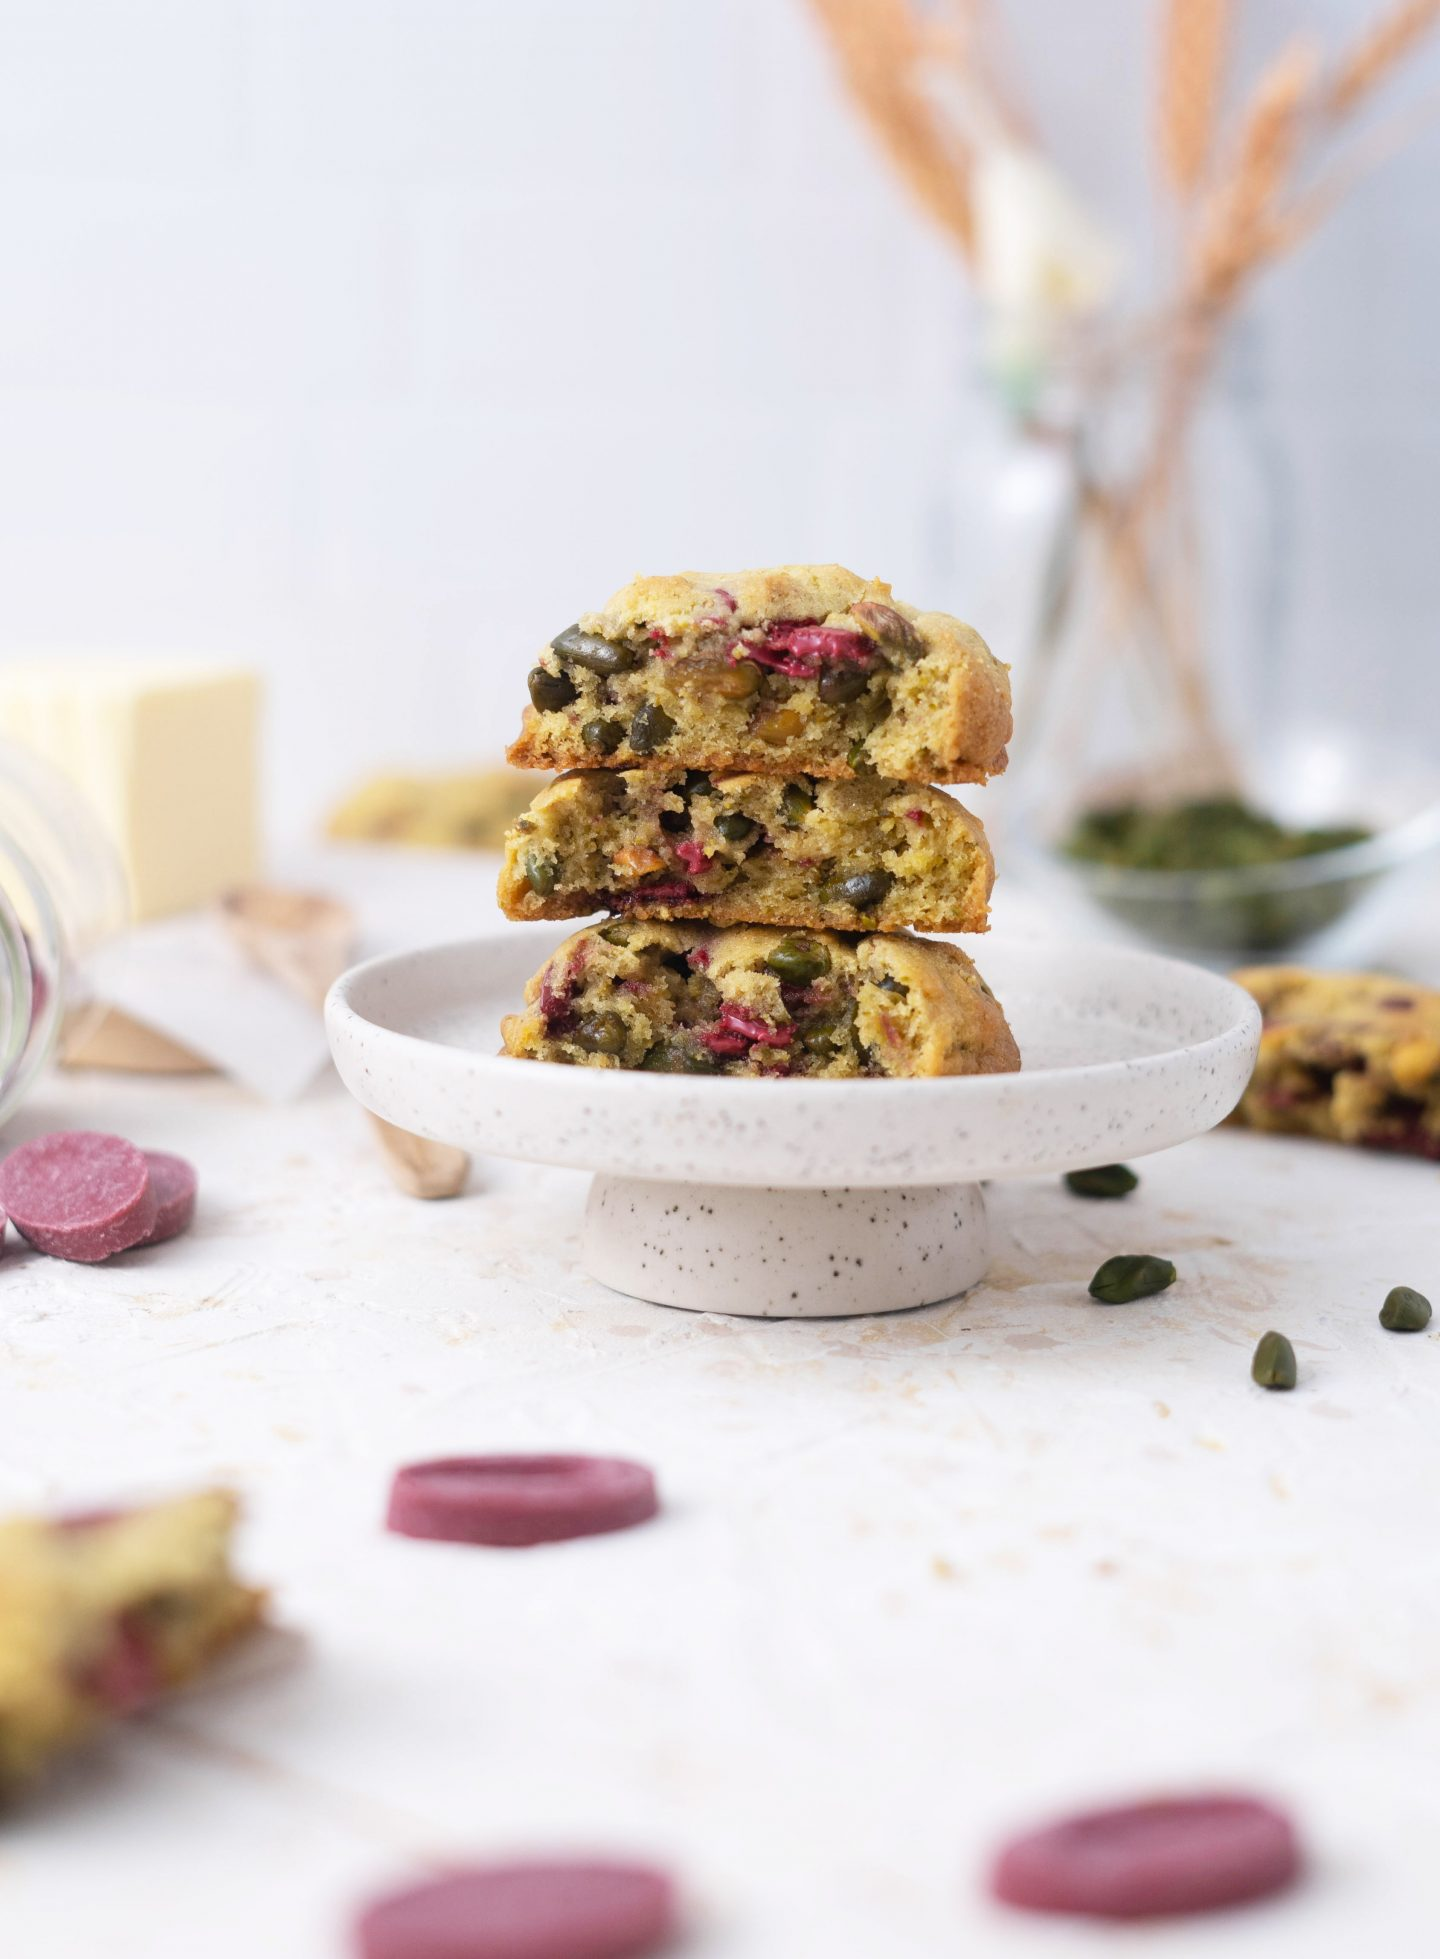 Recette Cookies pistache framboise